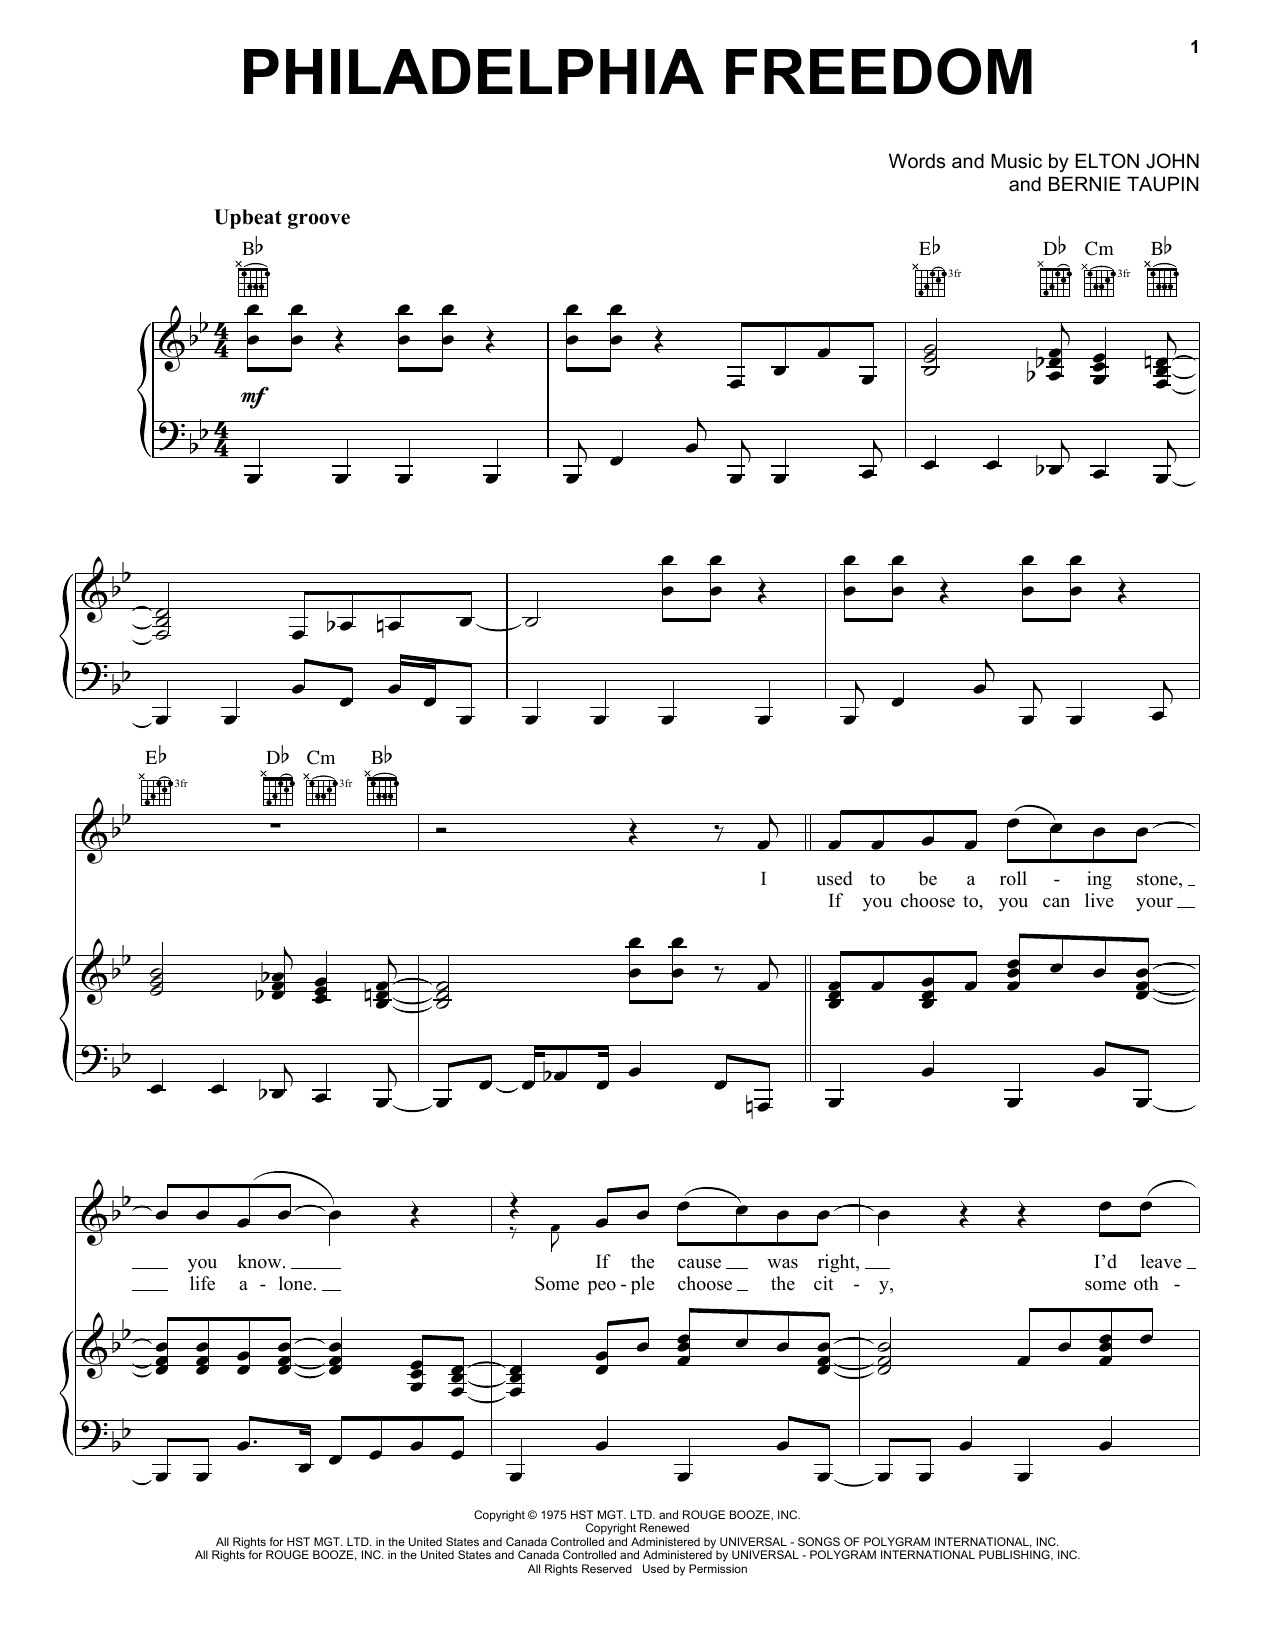 Elton John Philadelphia Freedom sheet music notes and chords. Download Printable PDF.